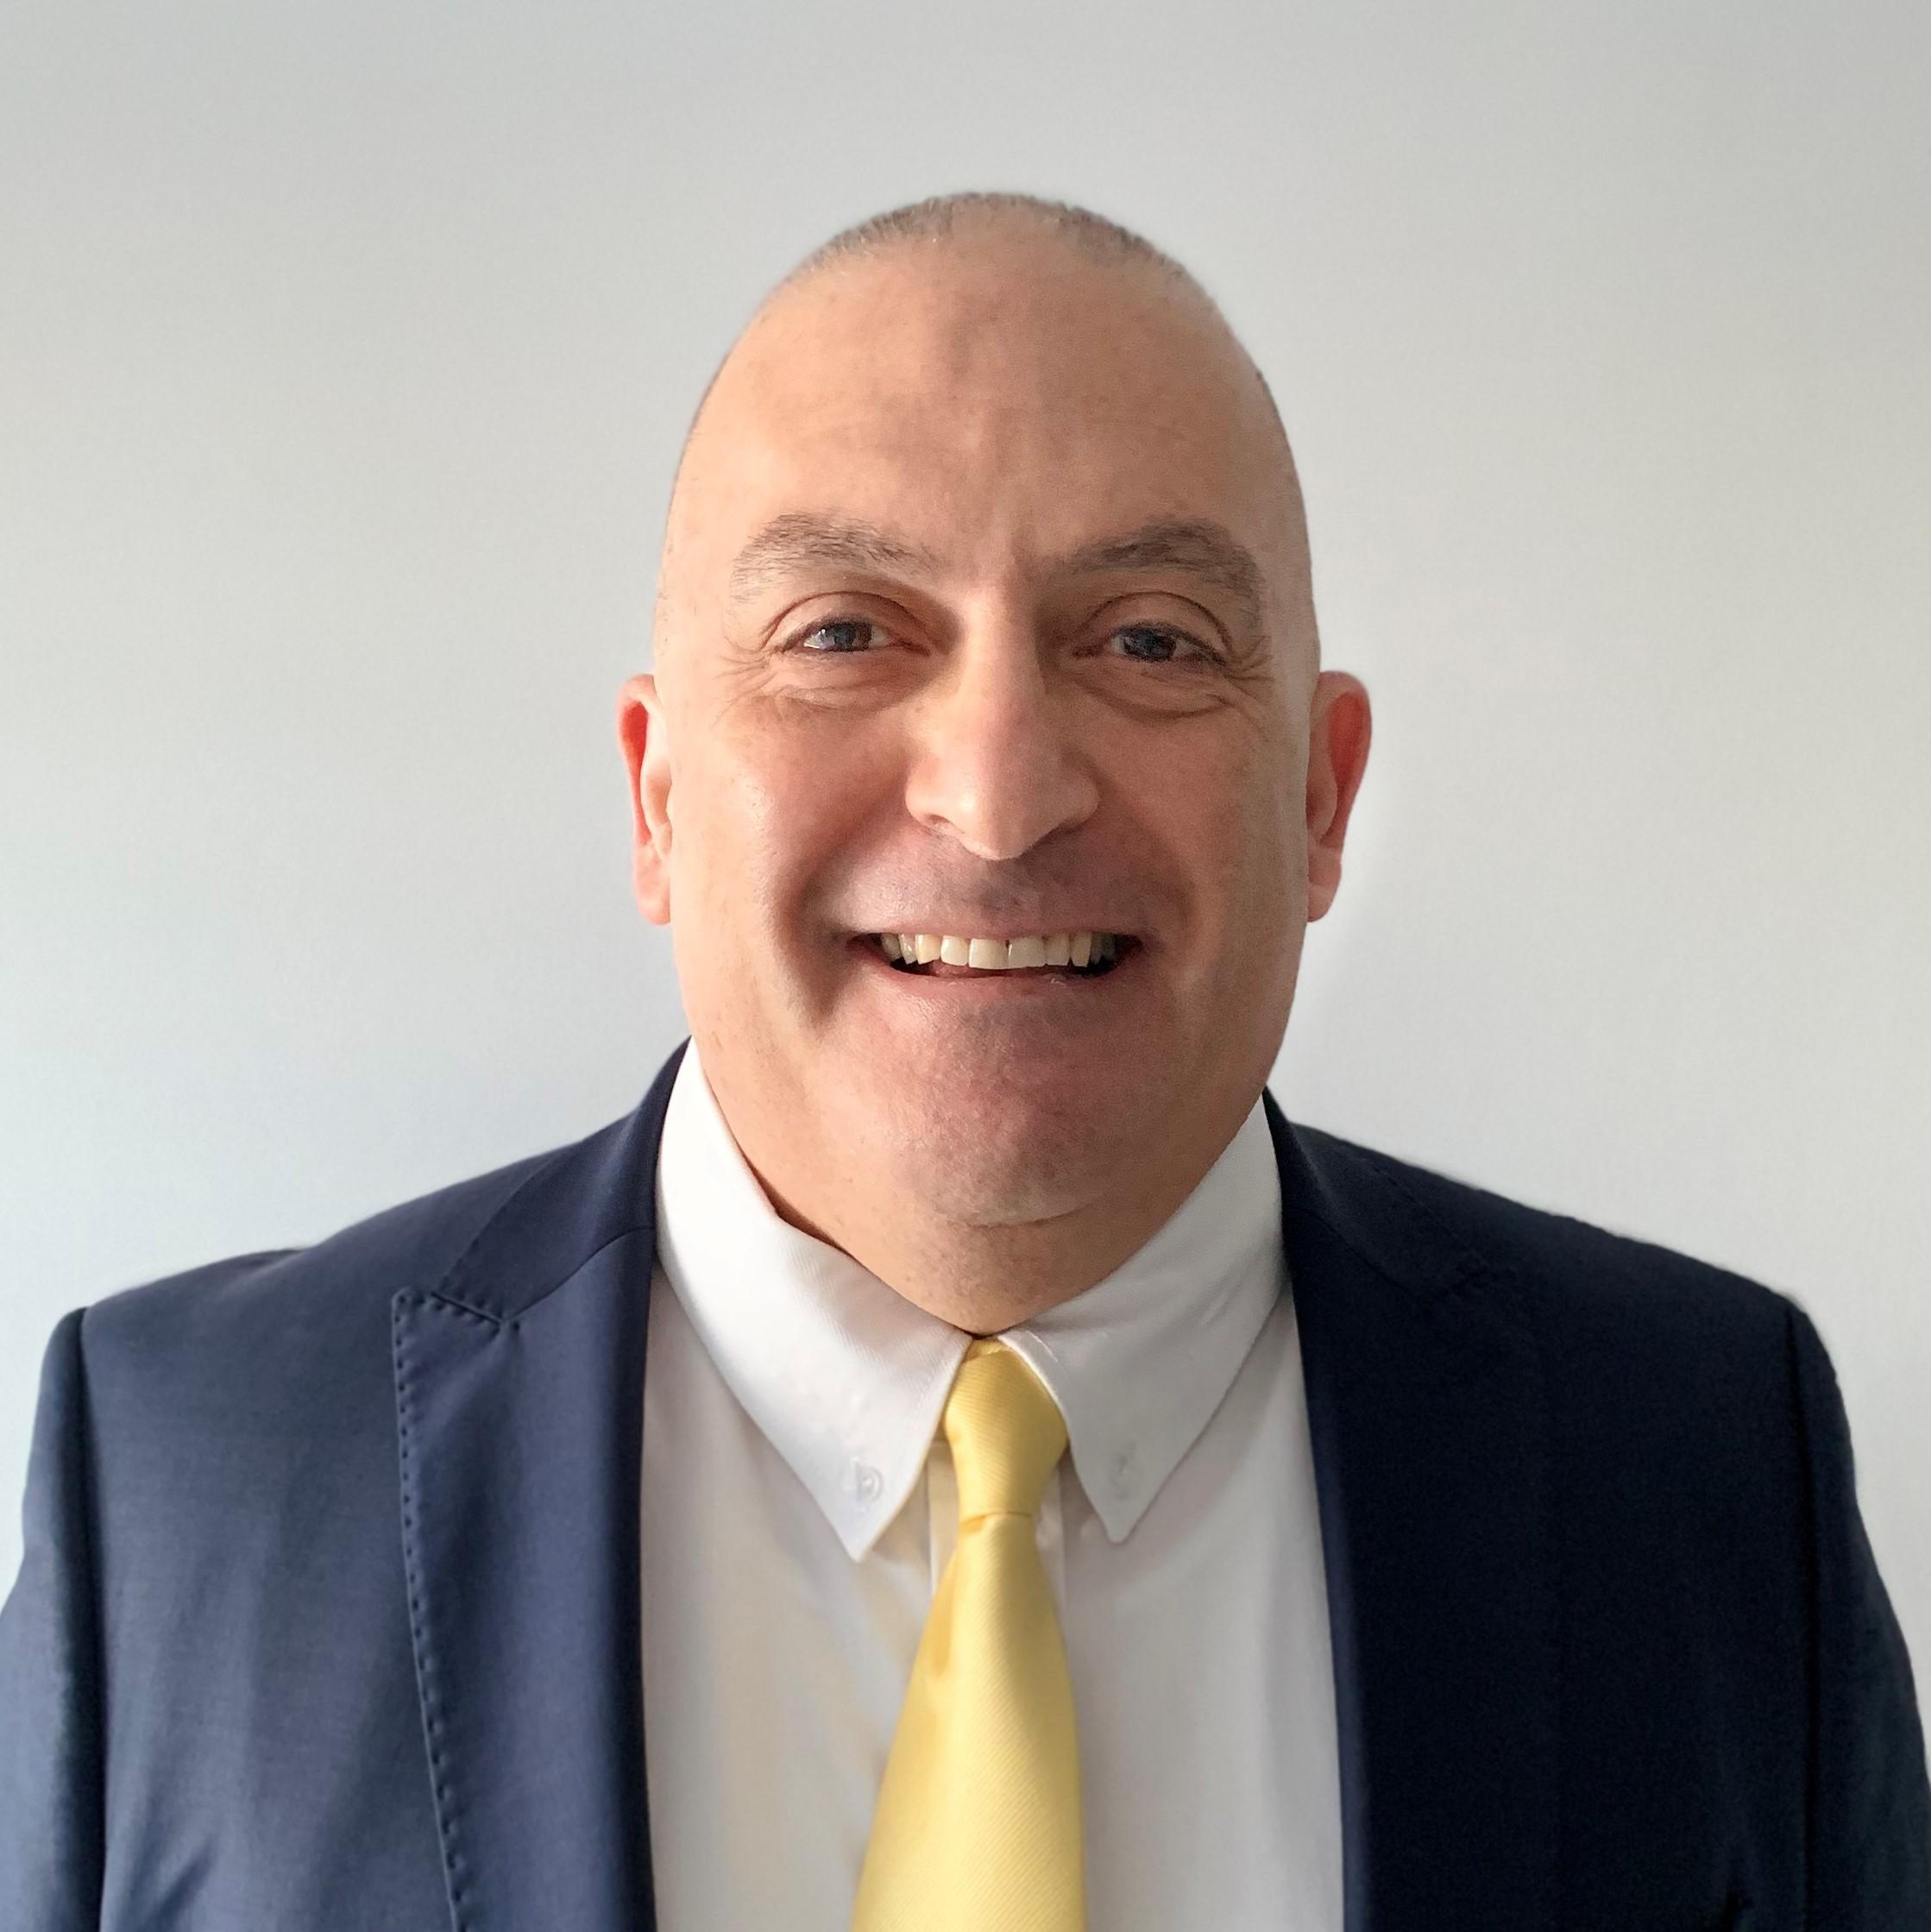 Sam Saba Appointed to Drive APAC Business for Mavenir